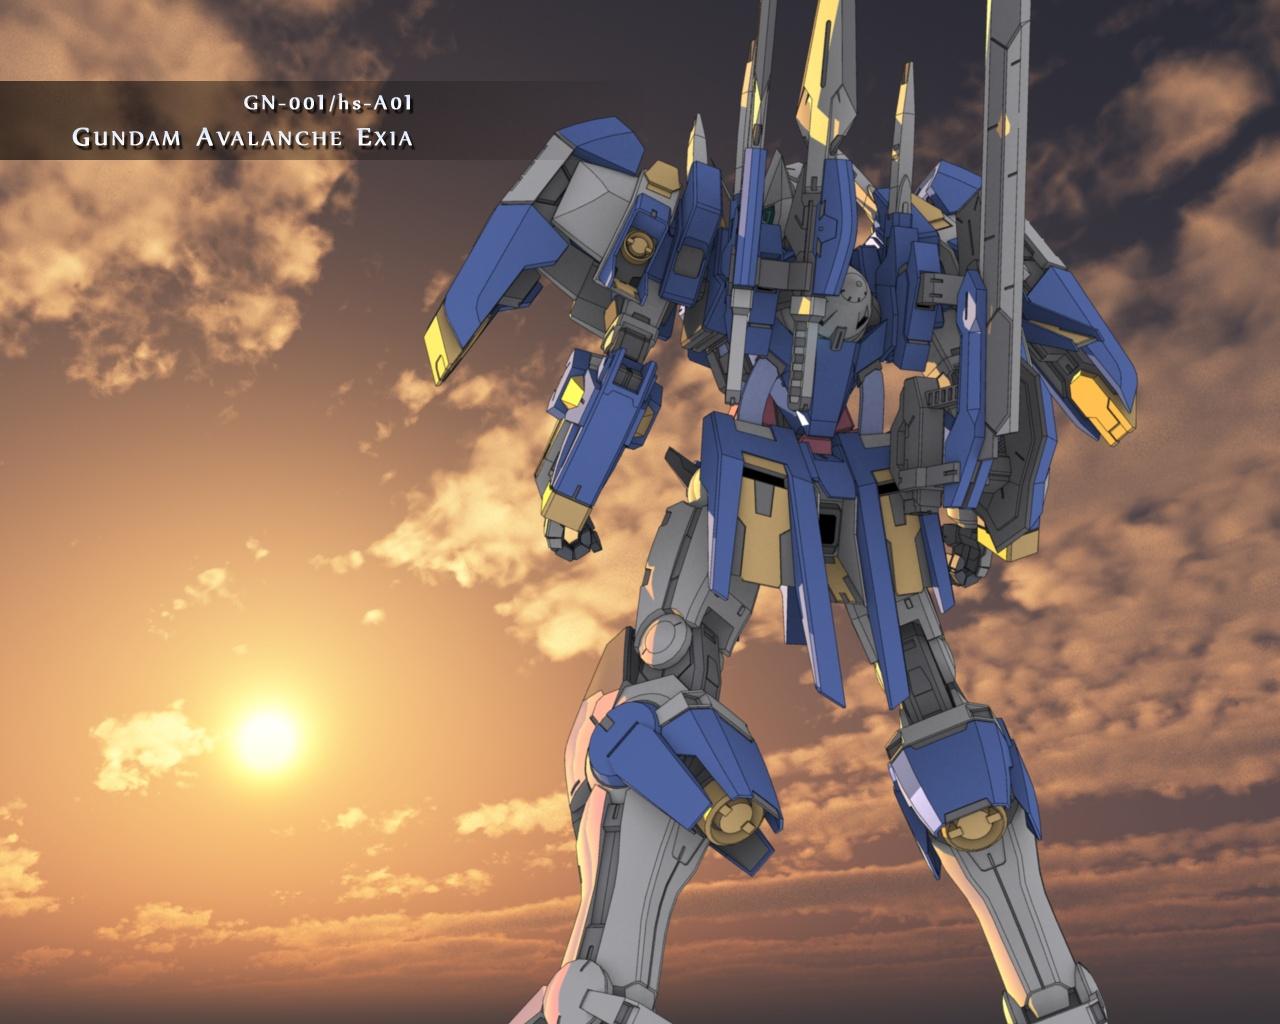 GN-001/hs-A01 Gundam Avalanche Exia - The Gundam Wiki - Wikia Gundam Wing Deathscythe Hell Wallpaper